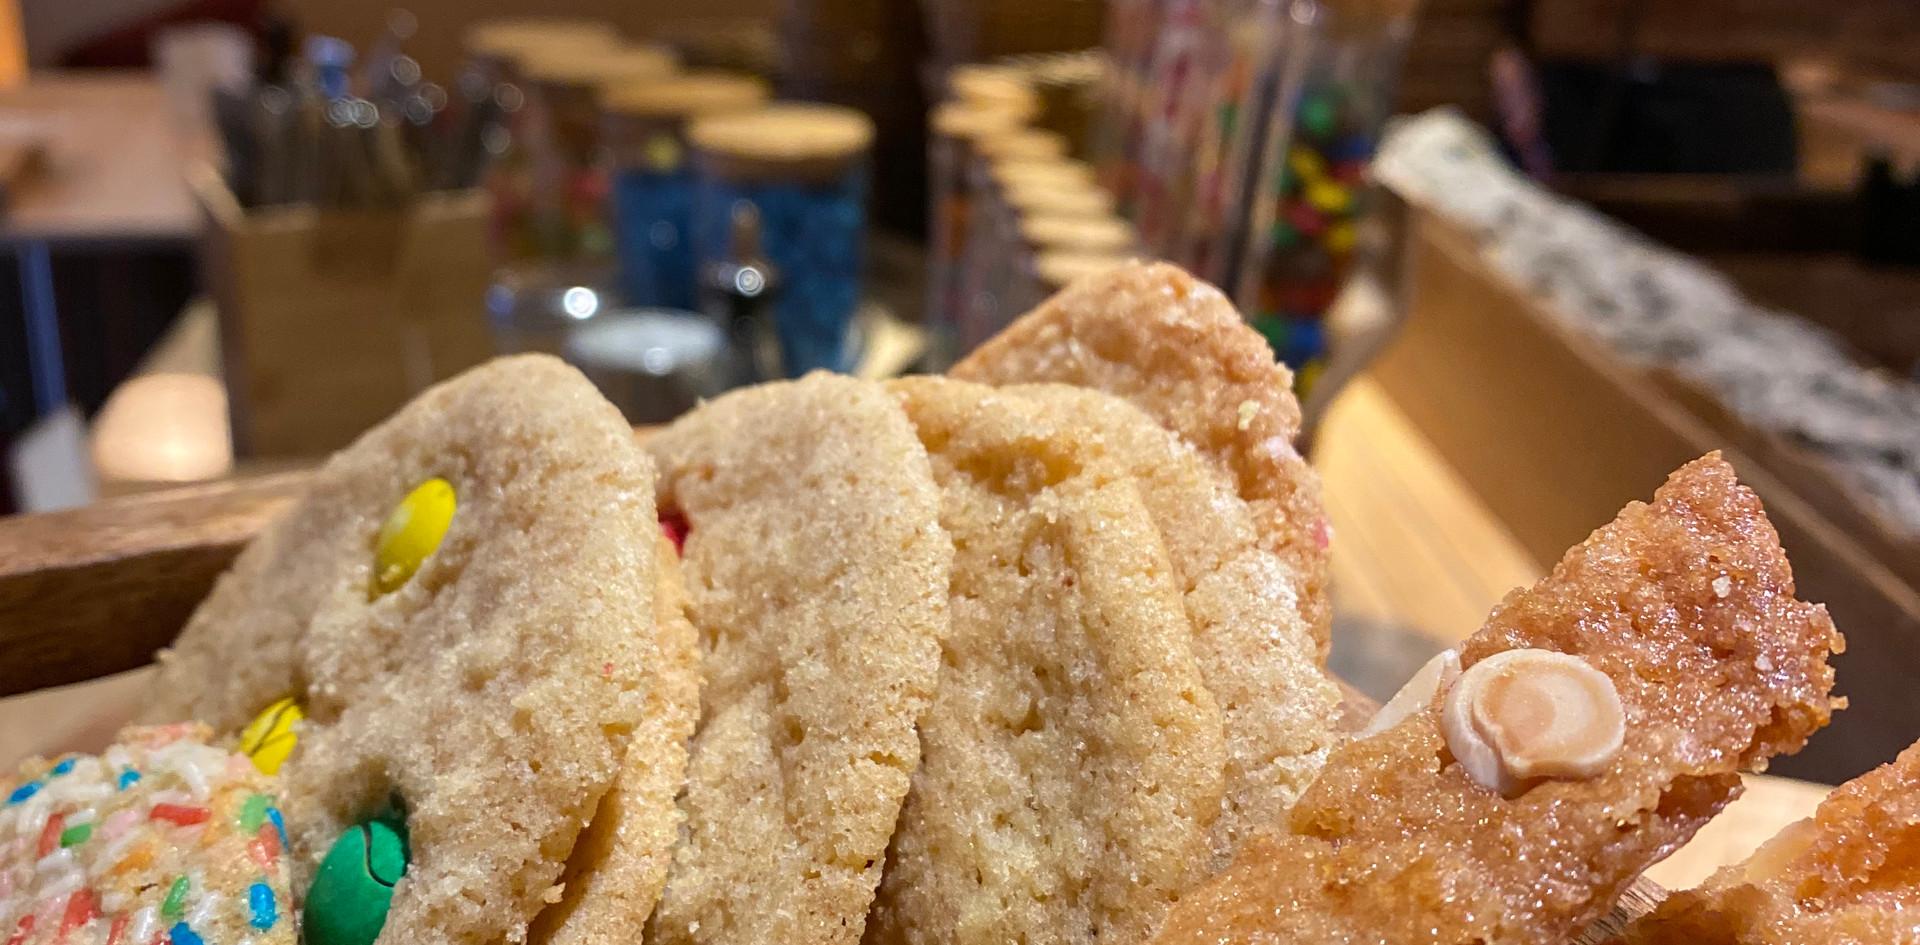 selbstgemachte Kekse Lunch & Sweet - Hotel Wegner - The culinary Art Hotel